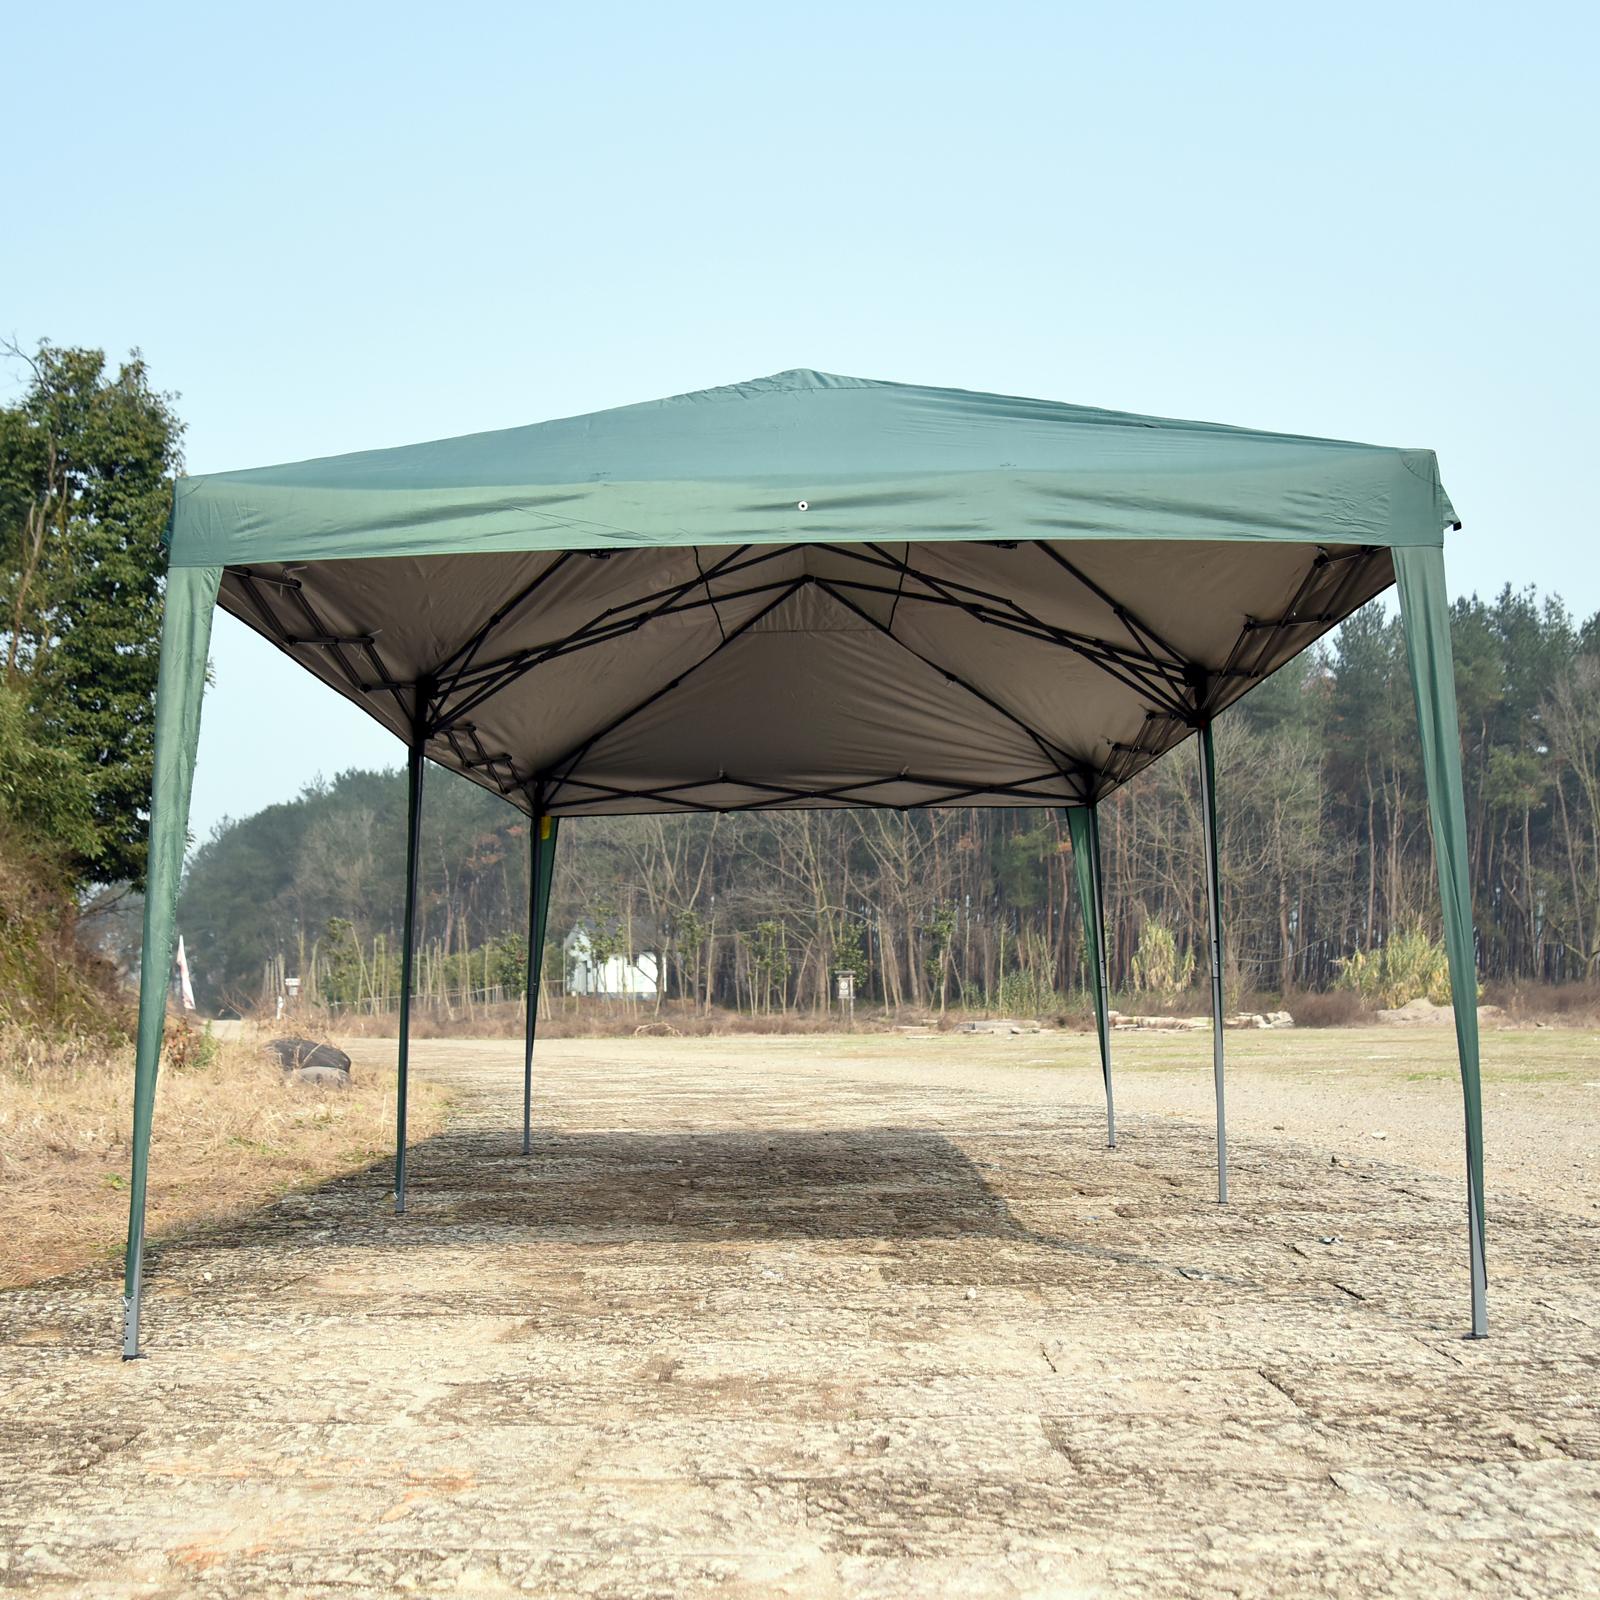 Outdoor-10-039-x20-039-EZ-POP-UP-Gazebo-Wedding-Party-Tent-Canopy-Folding-w-Carry-Bag thumbnail 26